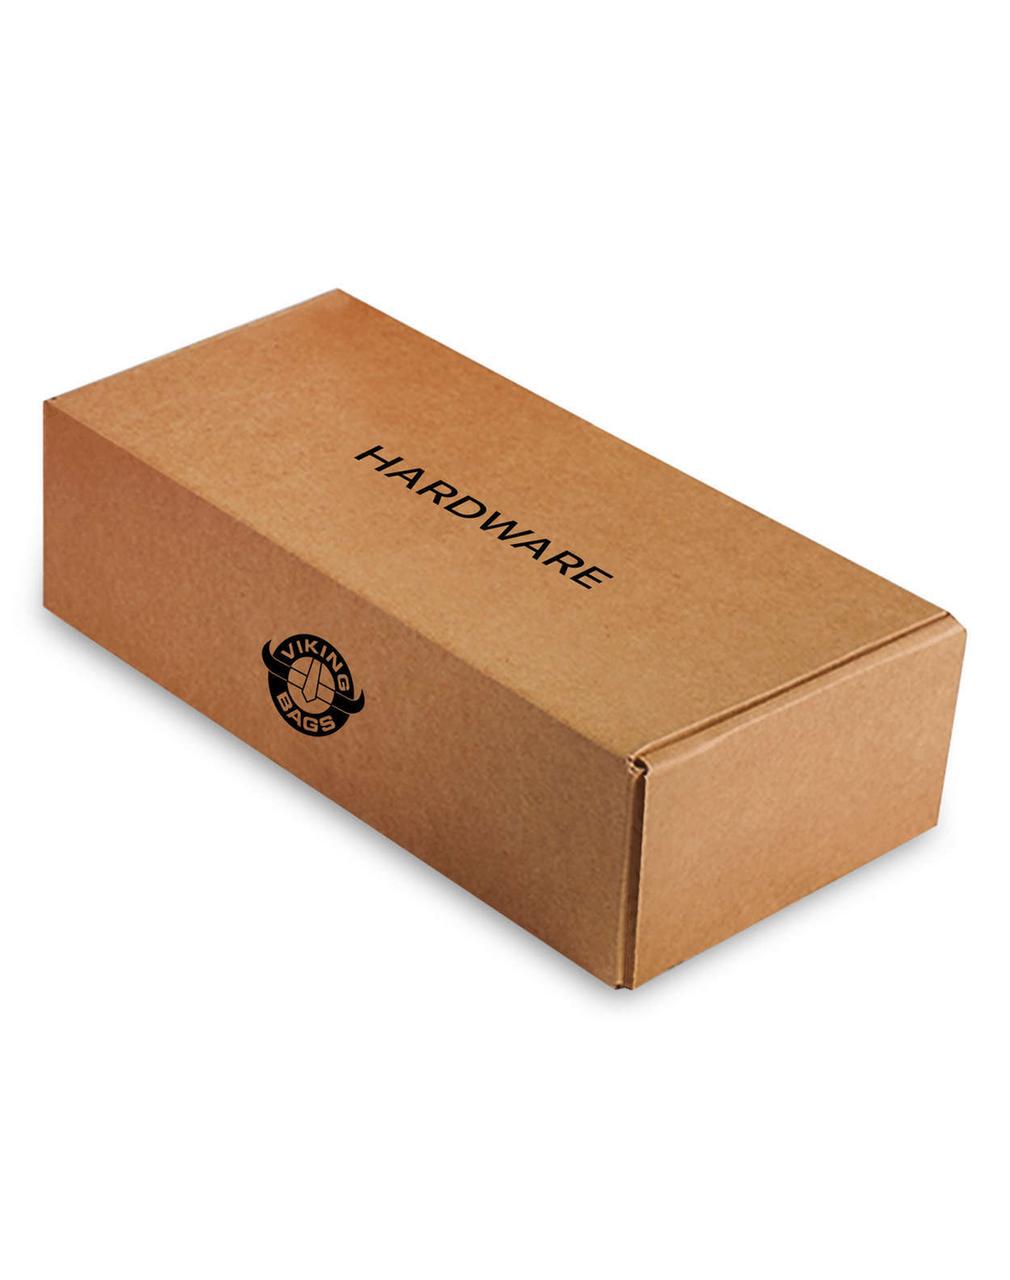 Honda VTX 1300 R Retro Lamellar Extra Large Shock Cutout Leather Covered Saddlebag Hardware Box